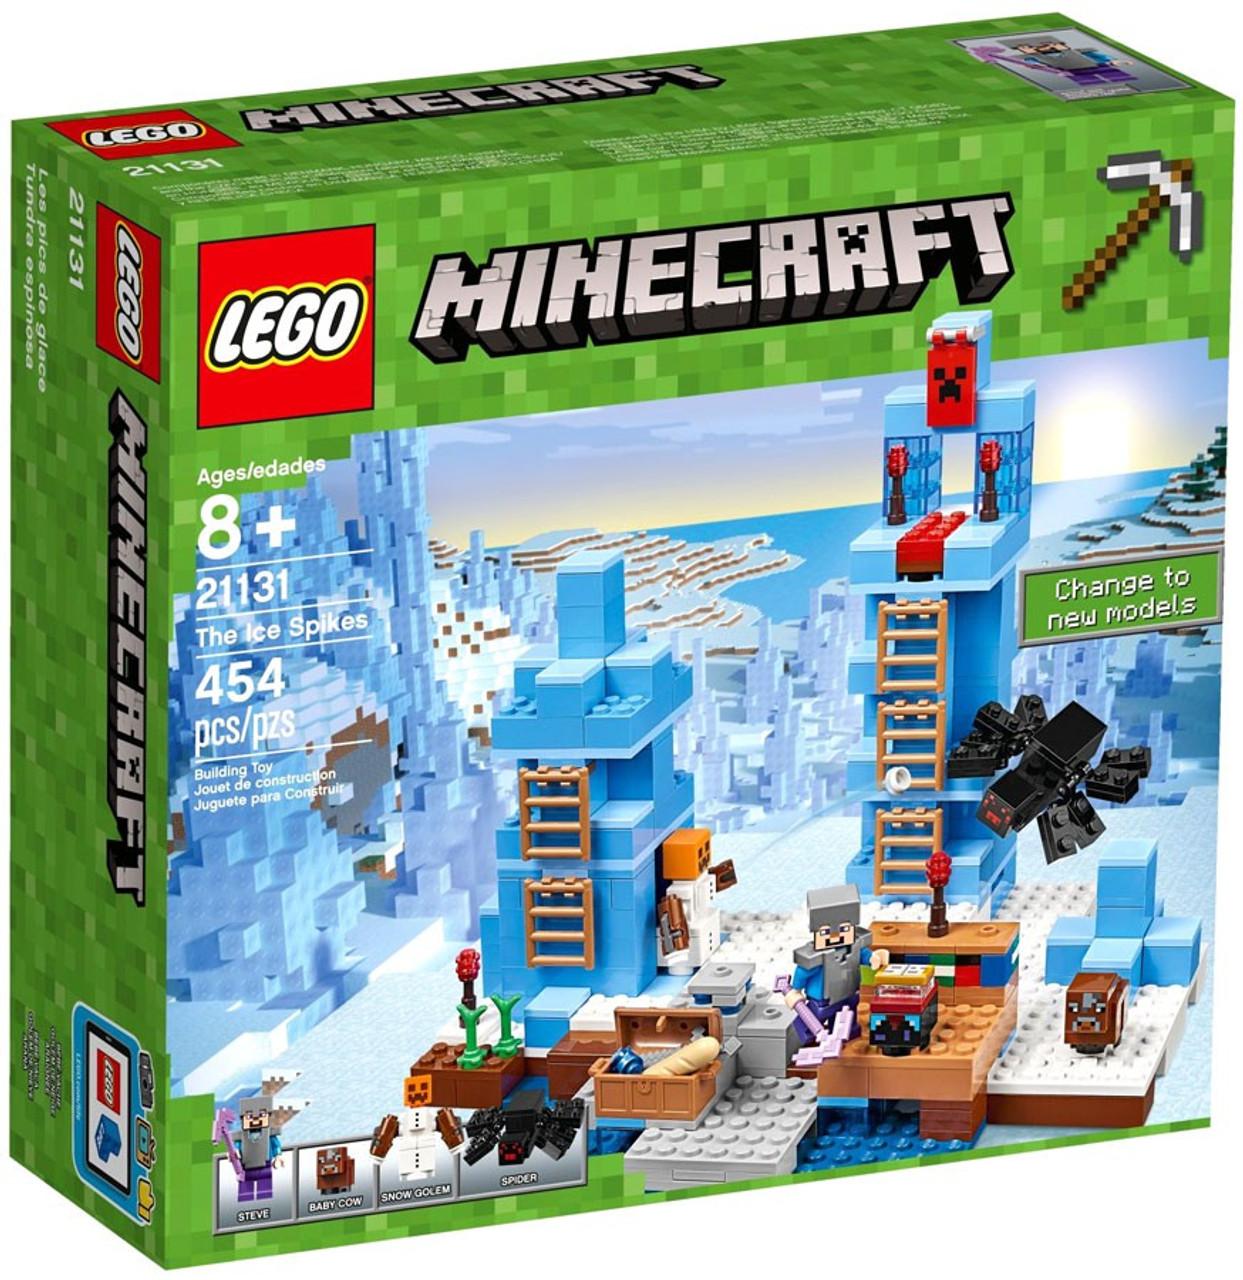 Lego Minecraft The Ice Spikes Set 21131 Toywiz 21124 End Portal